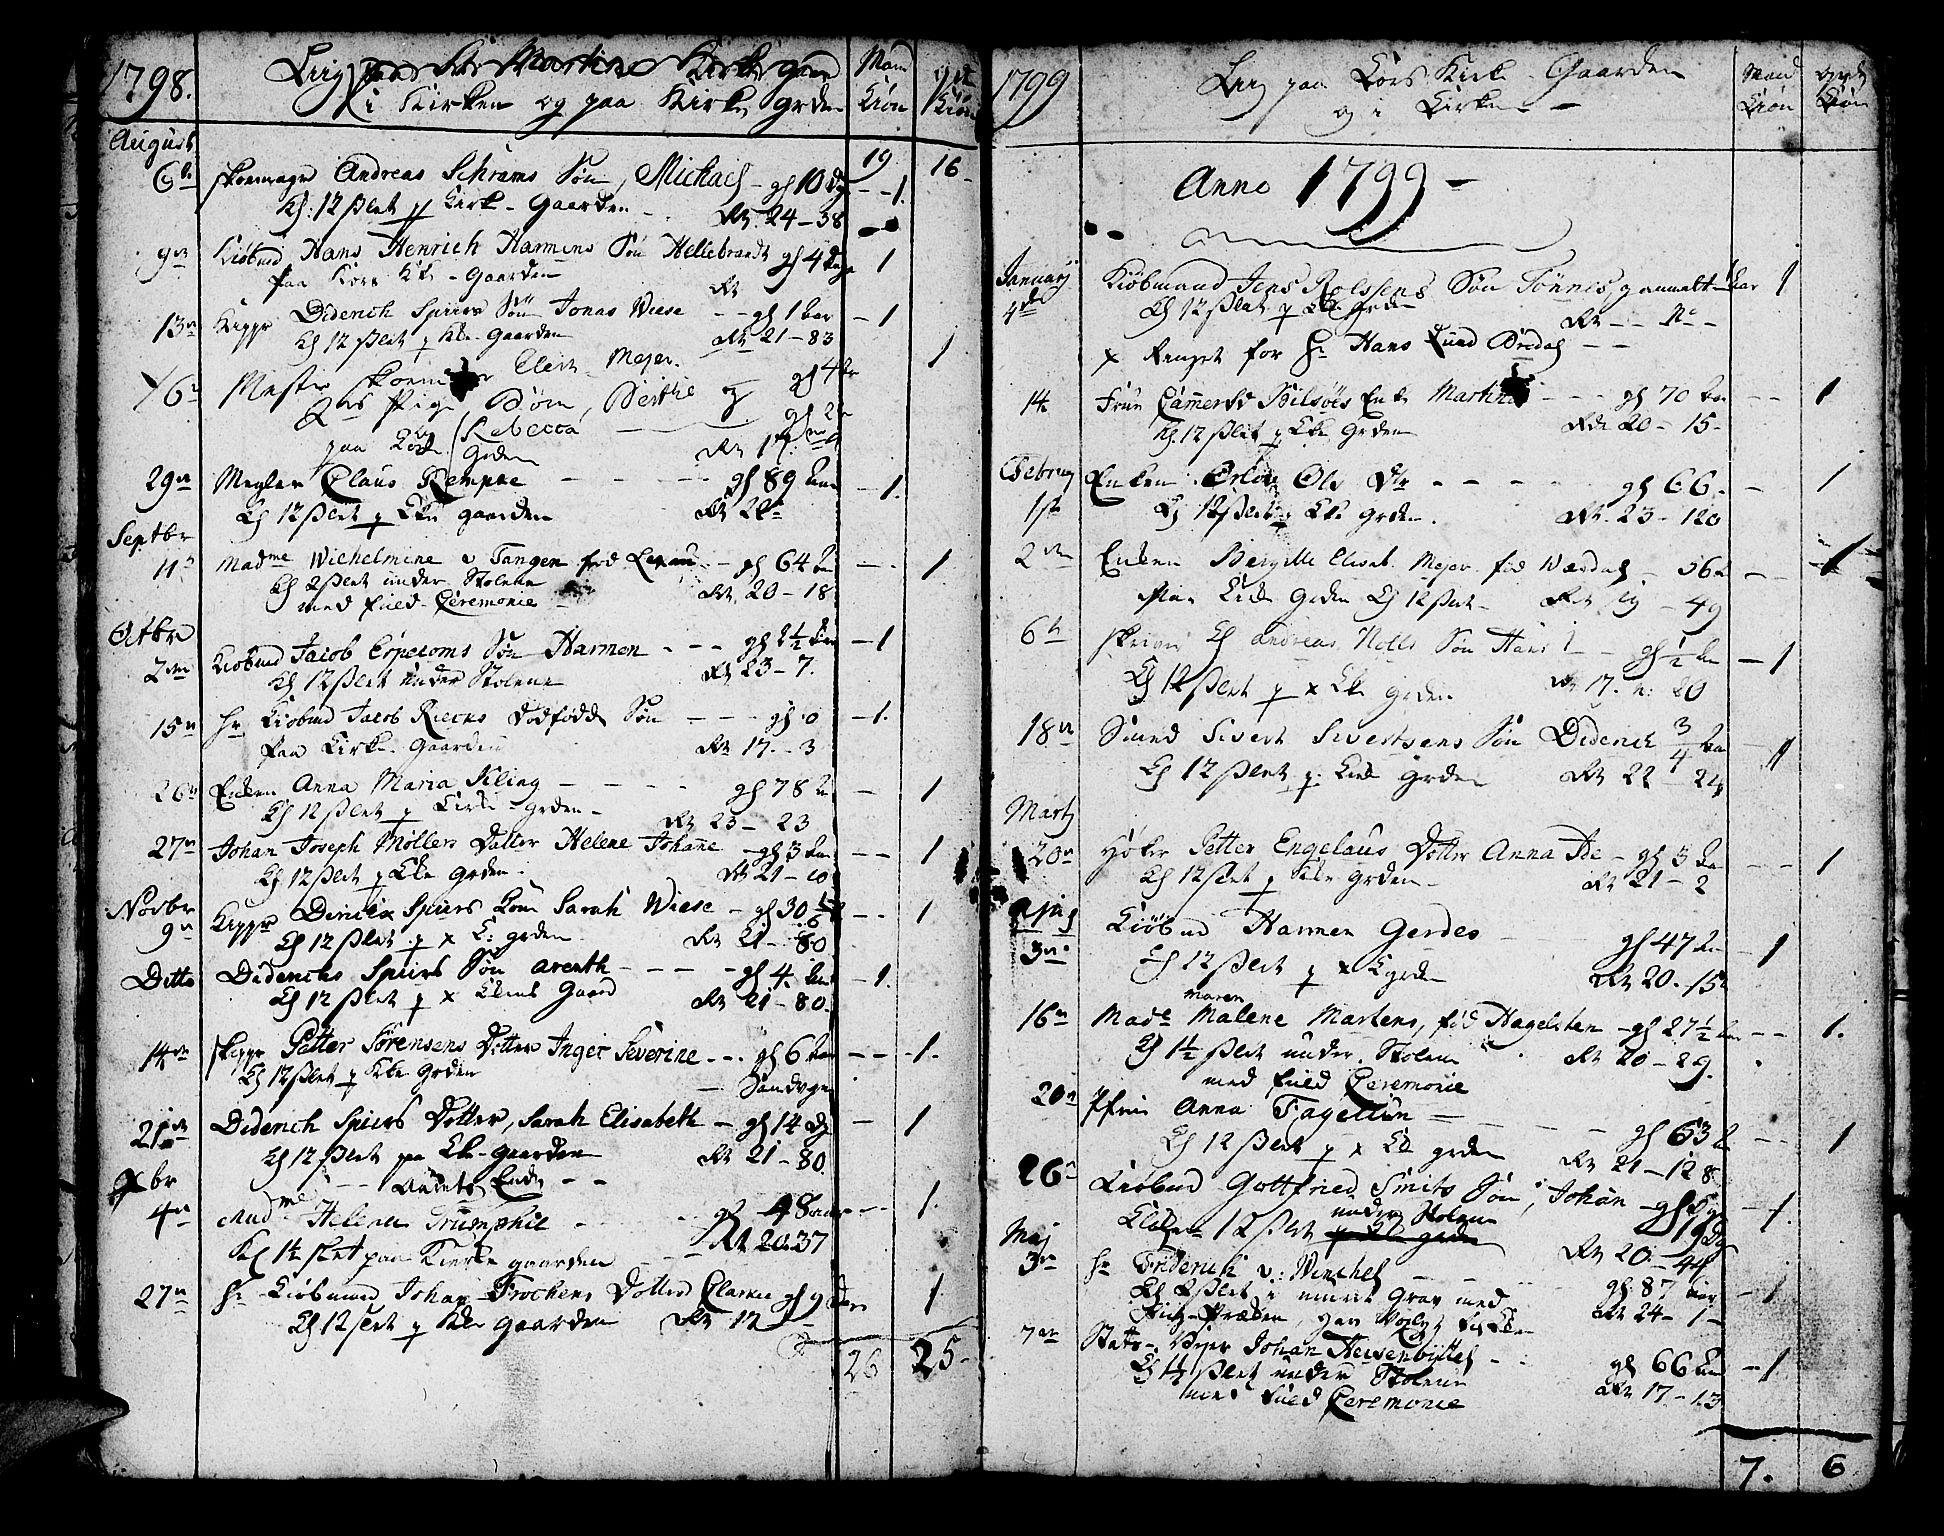 SAB, Korskirken Sokneprestembete, H/Haa/L0012: Parish register (official) no. A 12, 1786-1832, p. 159